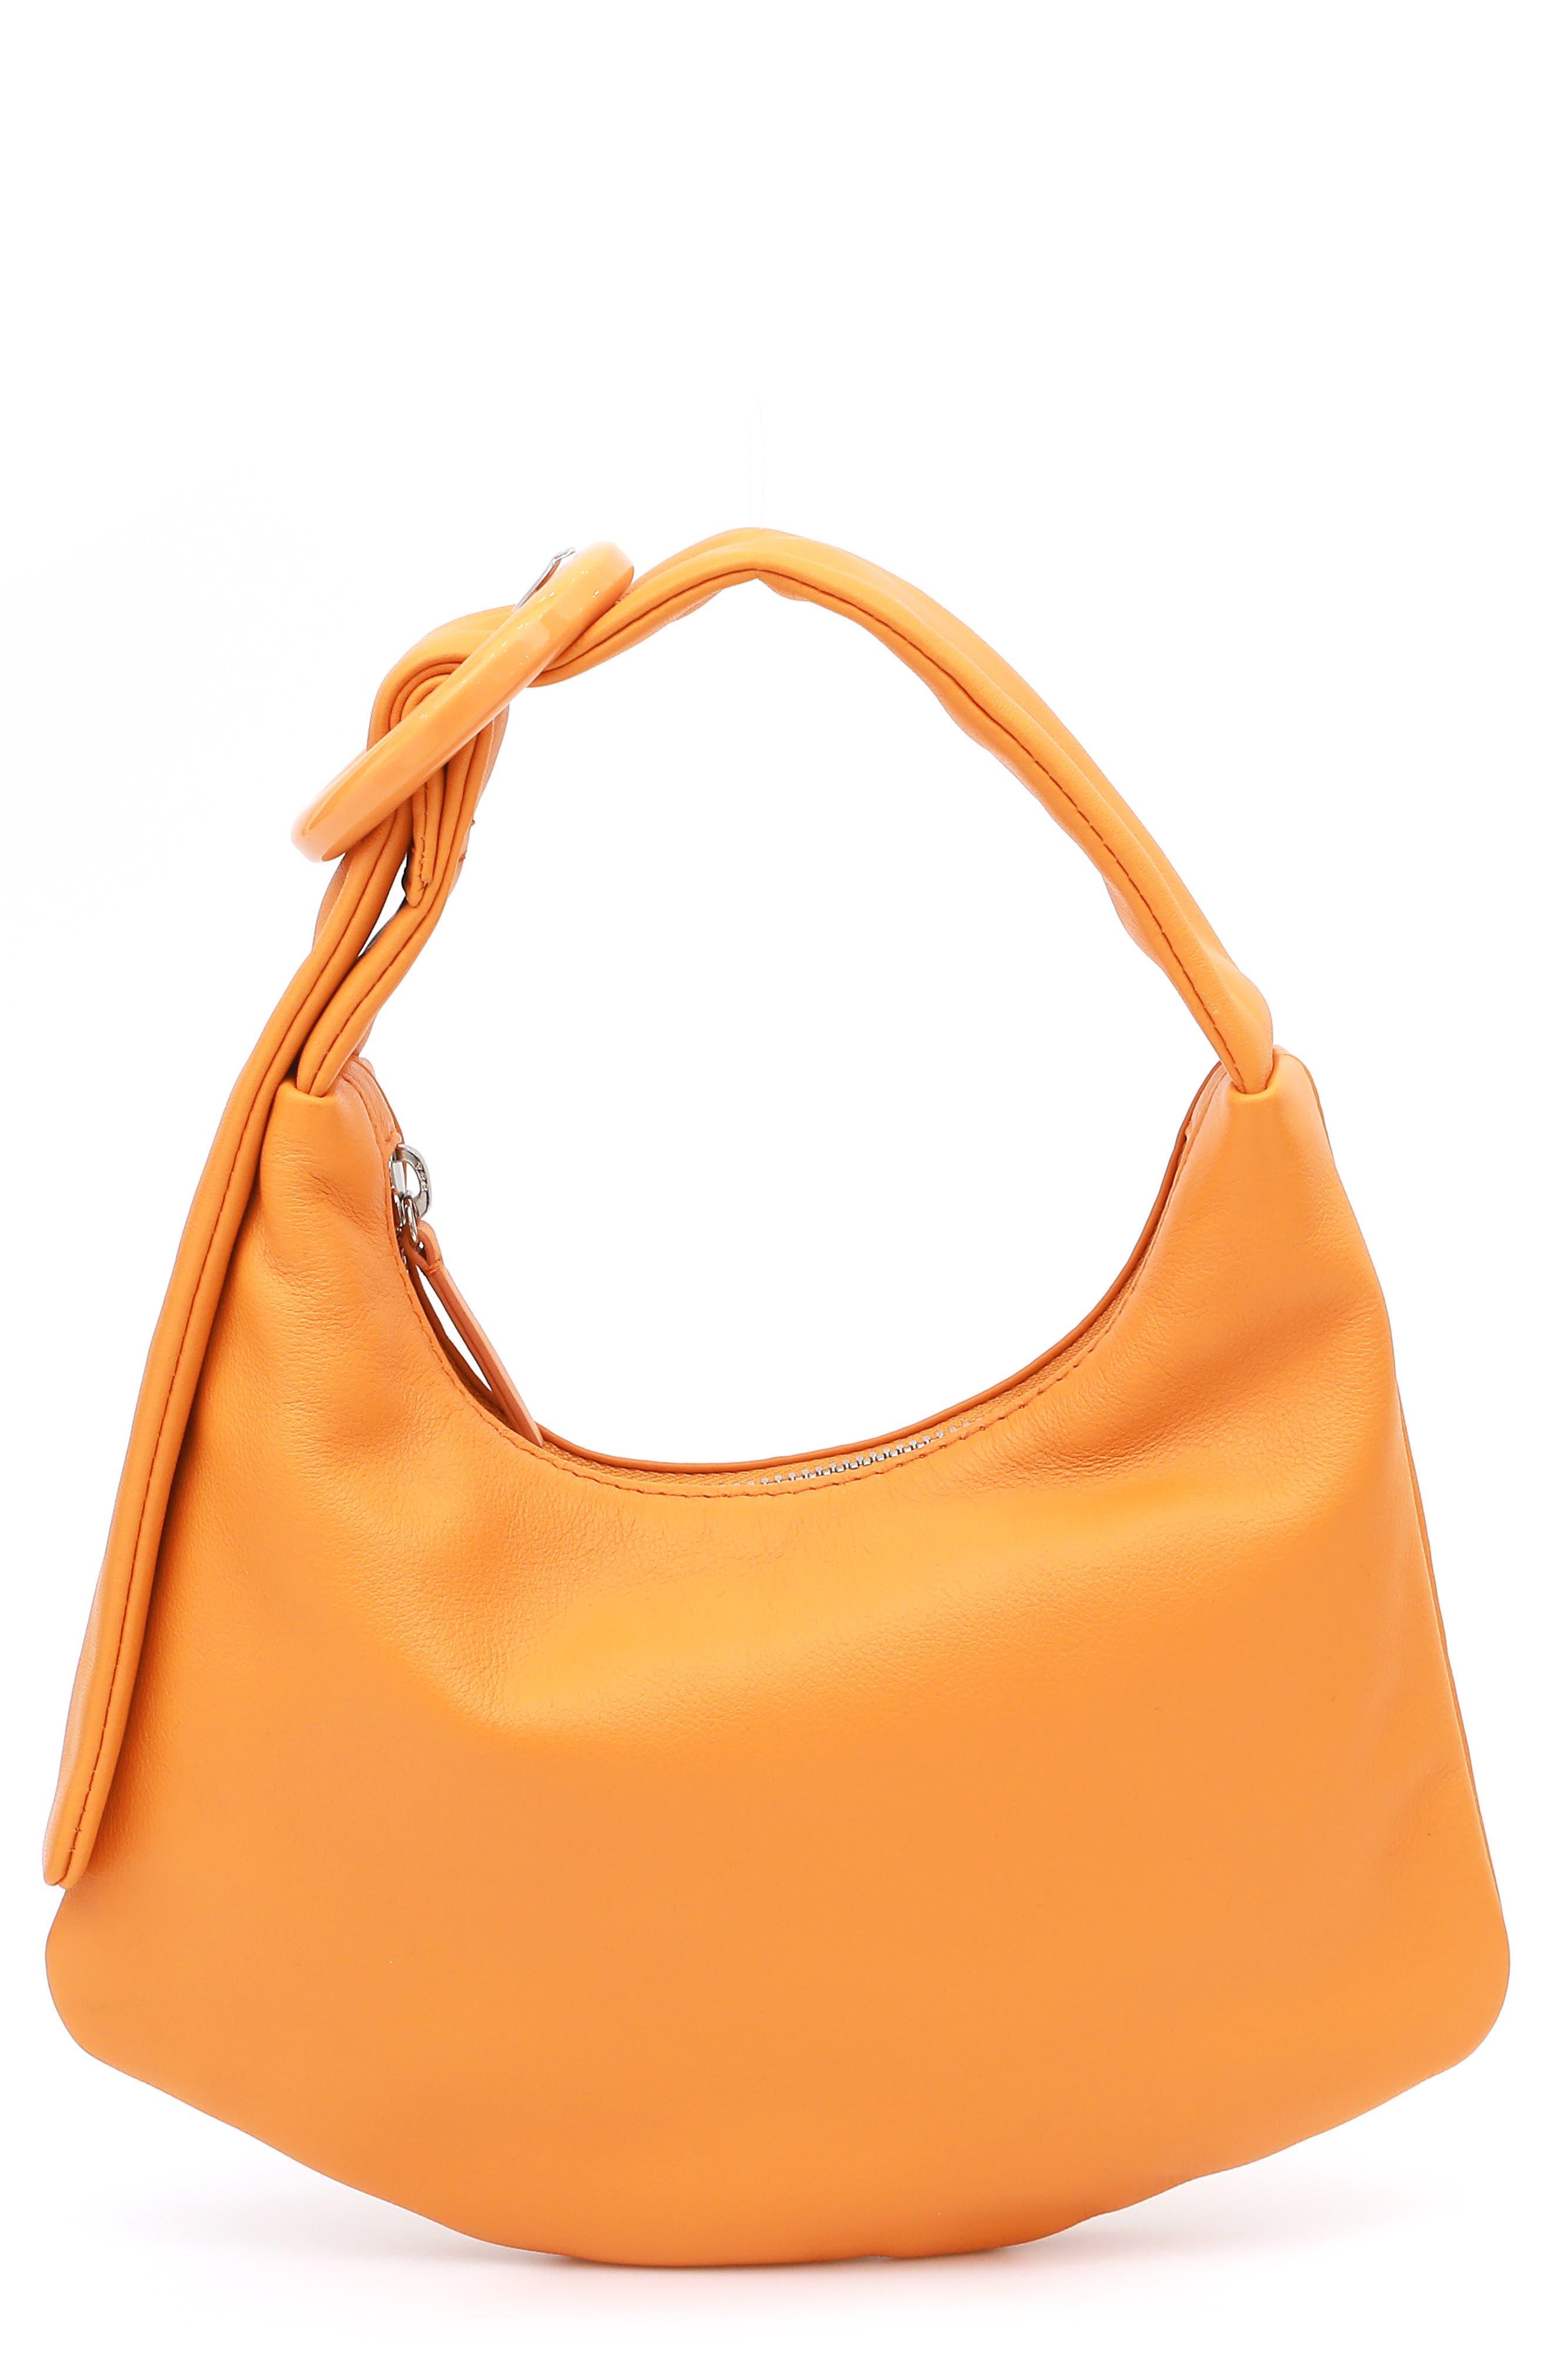 Gu-De Small Lisa Leather Shoulder Bag